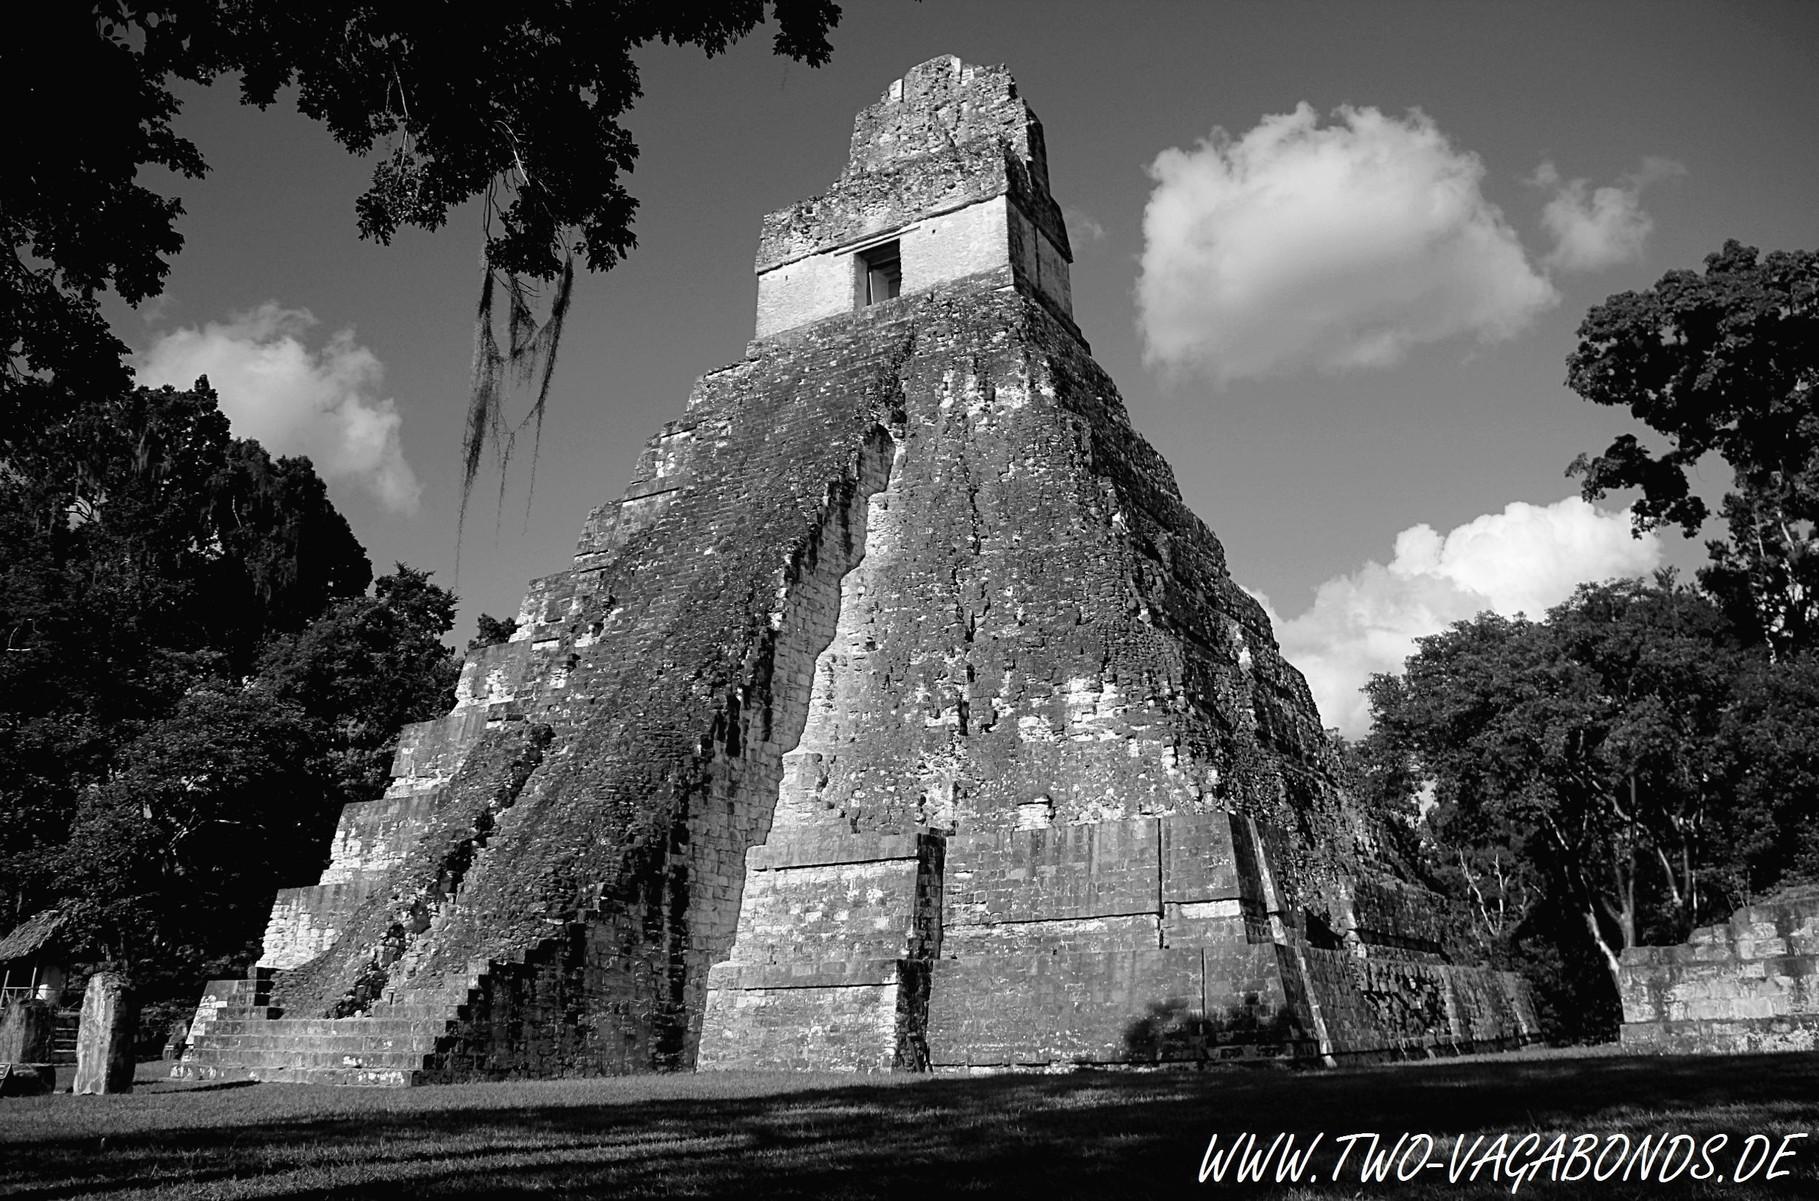 GUATEMALA 2012 - TIKAL